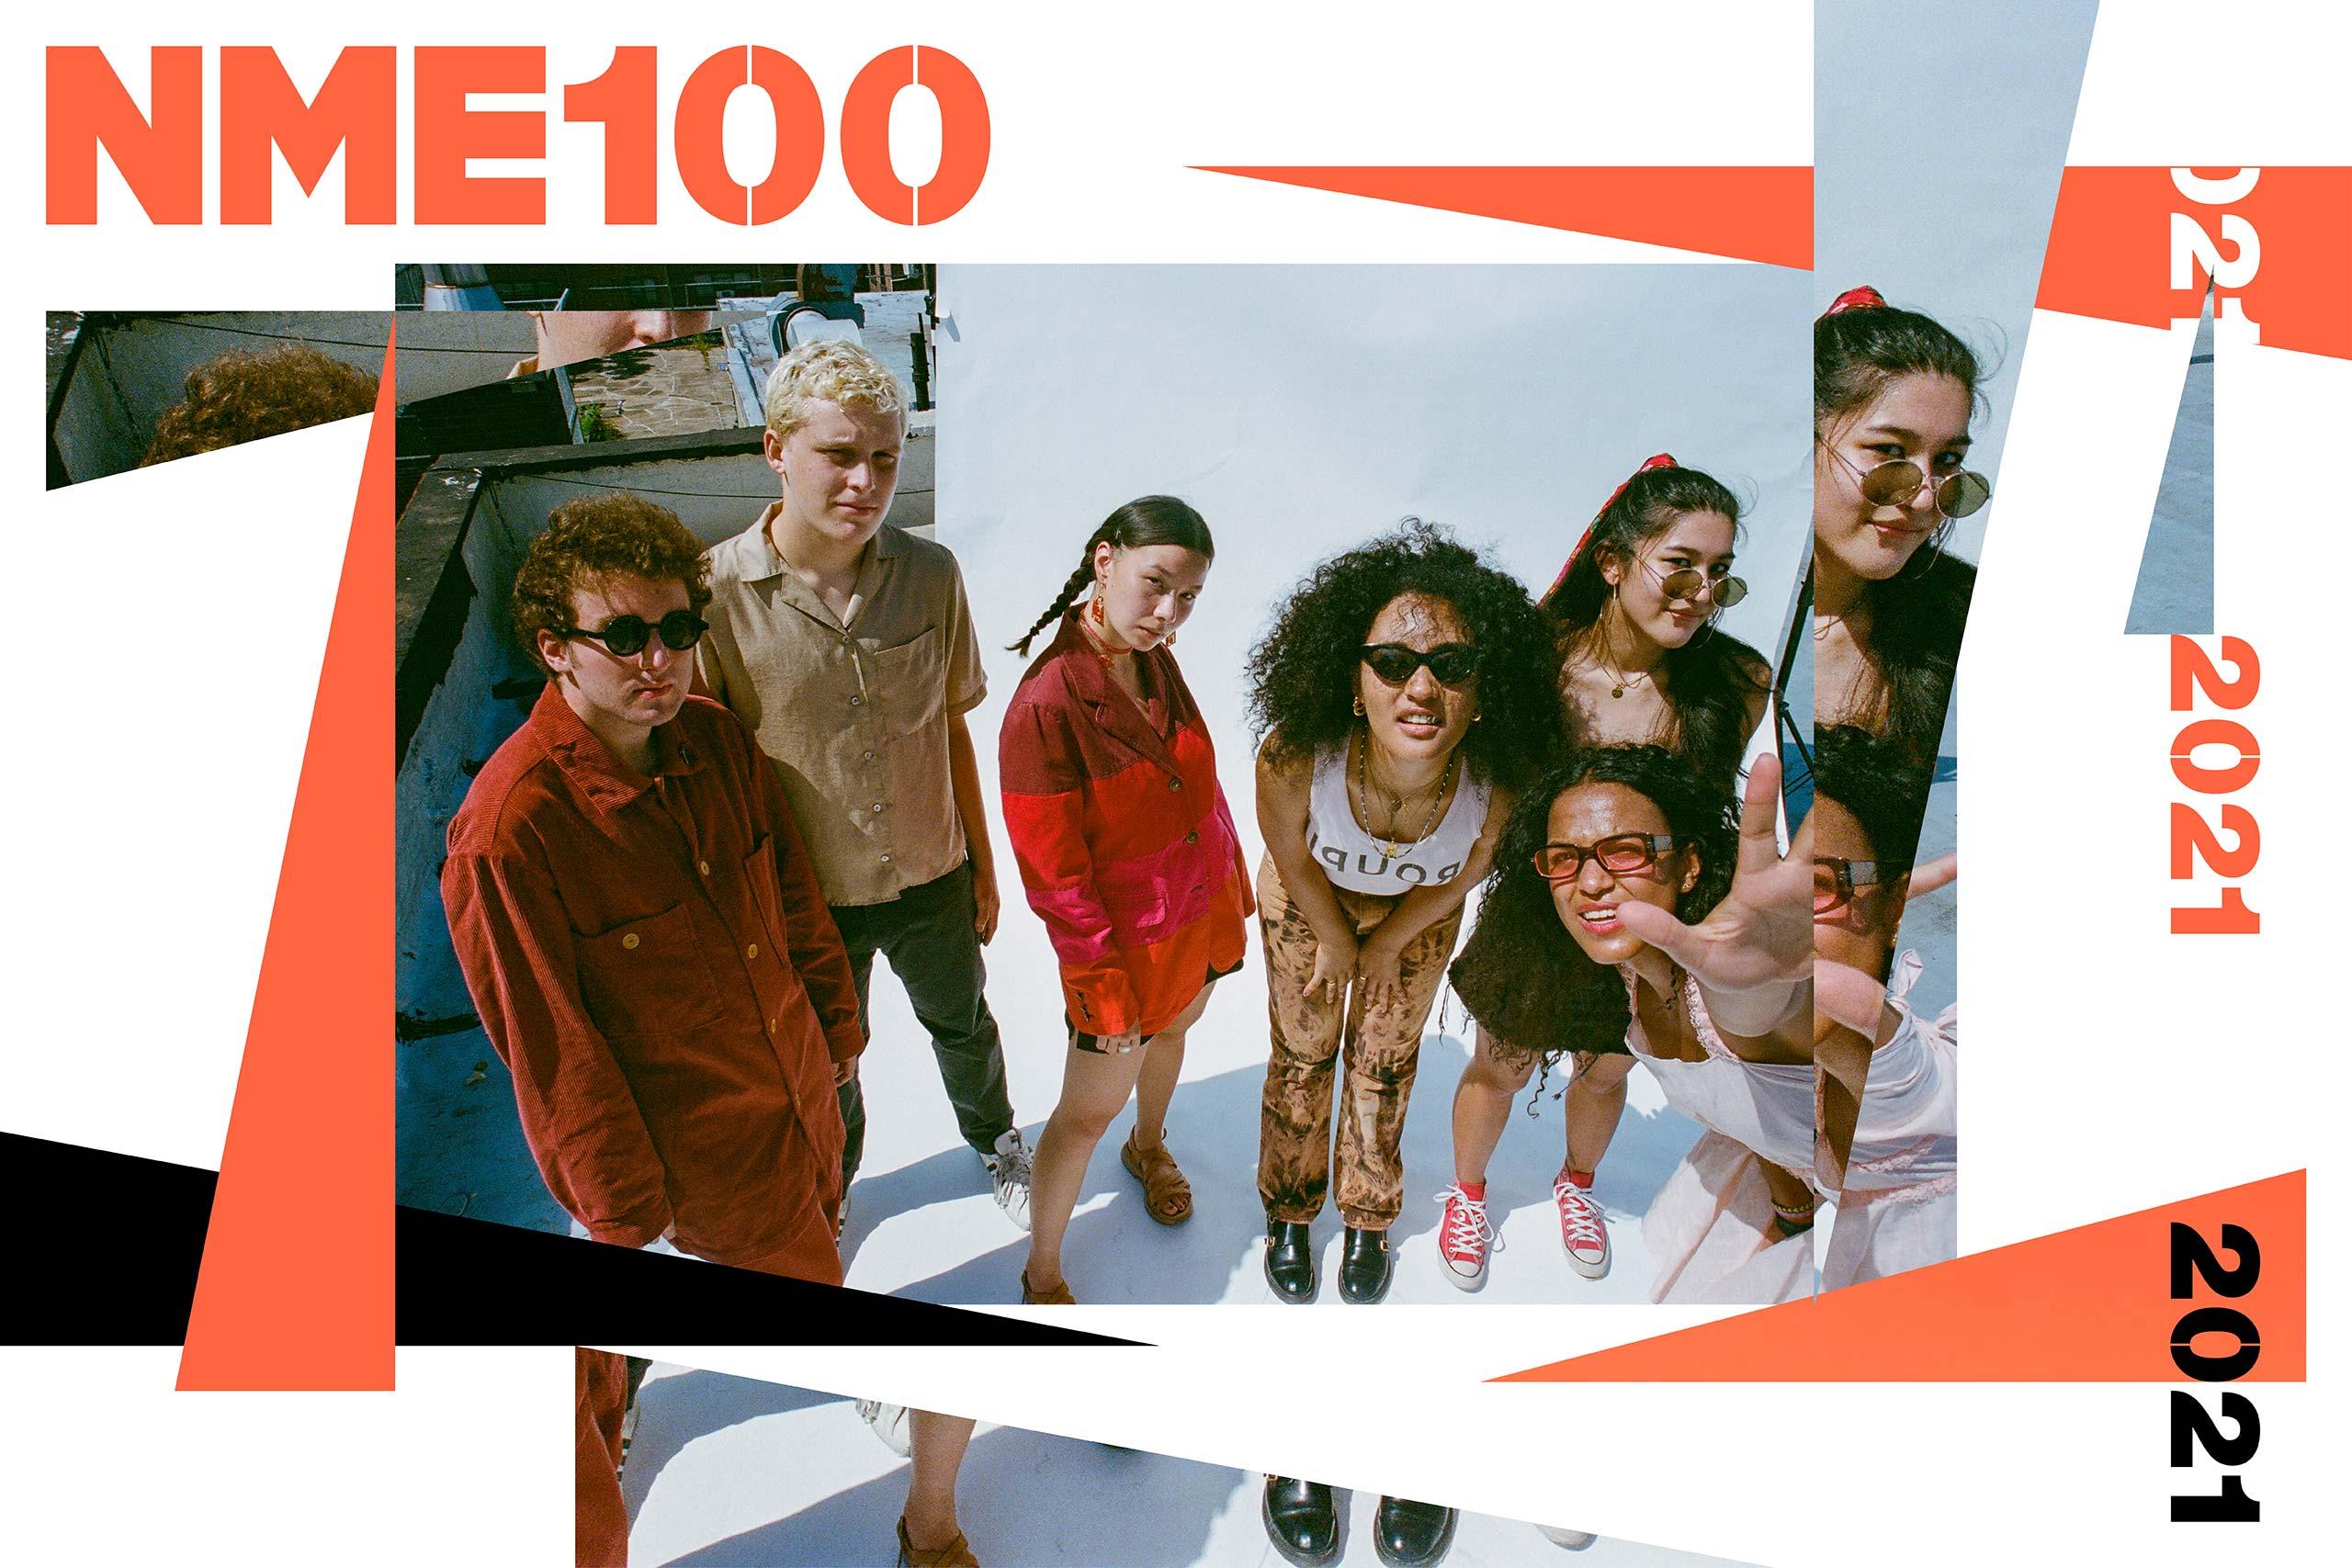 NME 100 michelle